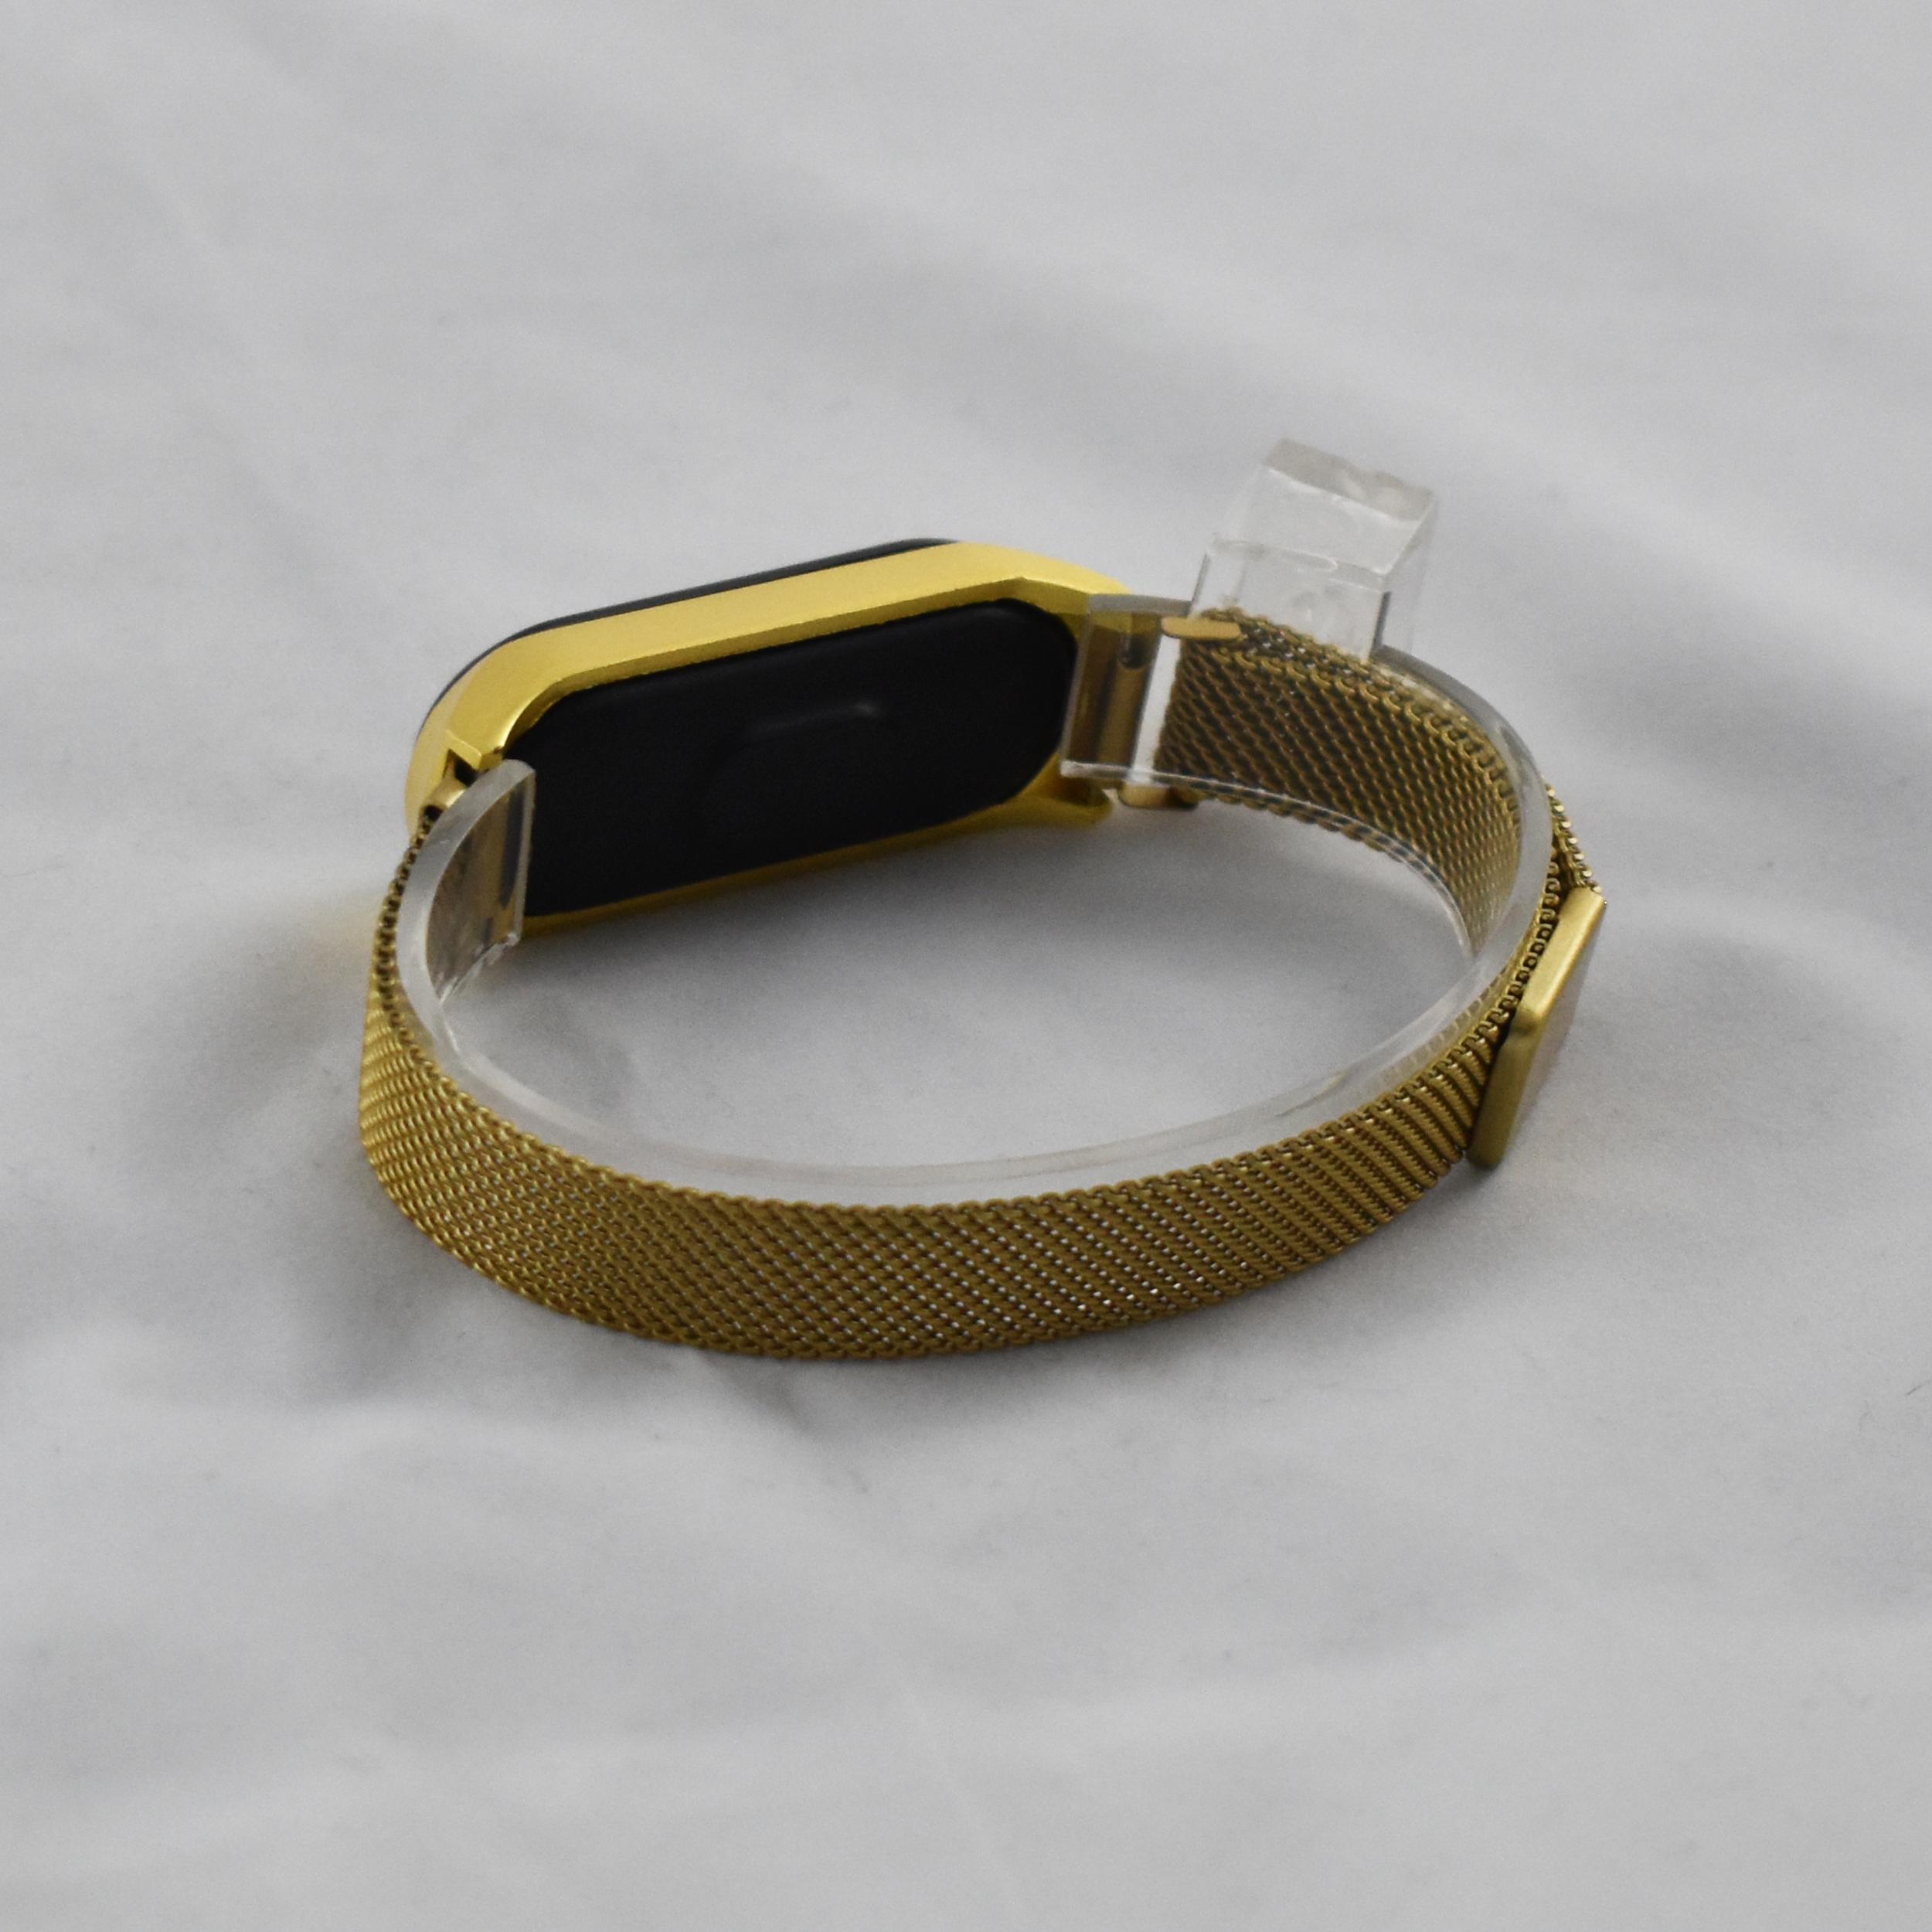 ساعت مچی دیجیتال مدل لمسی 172